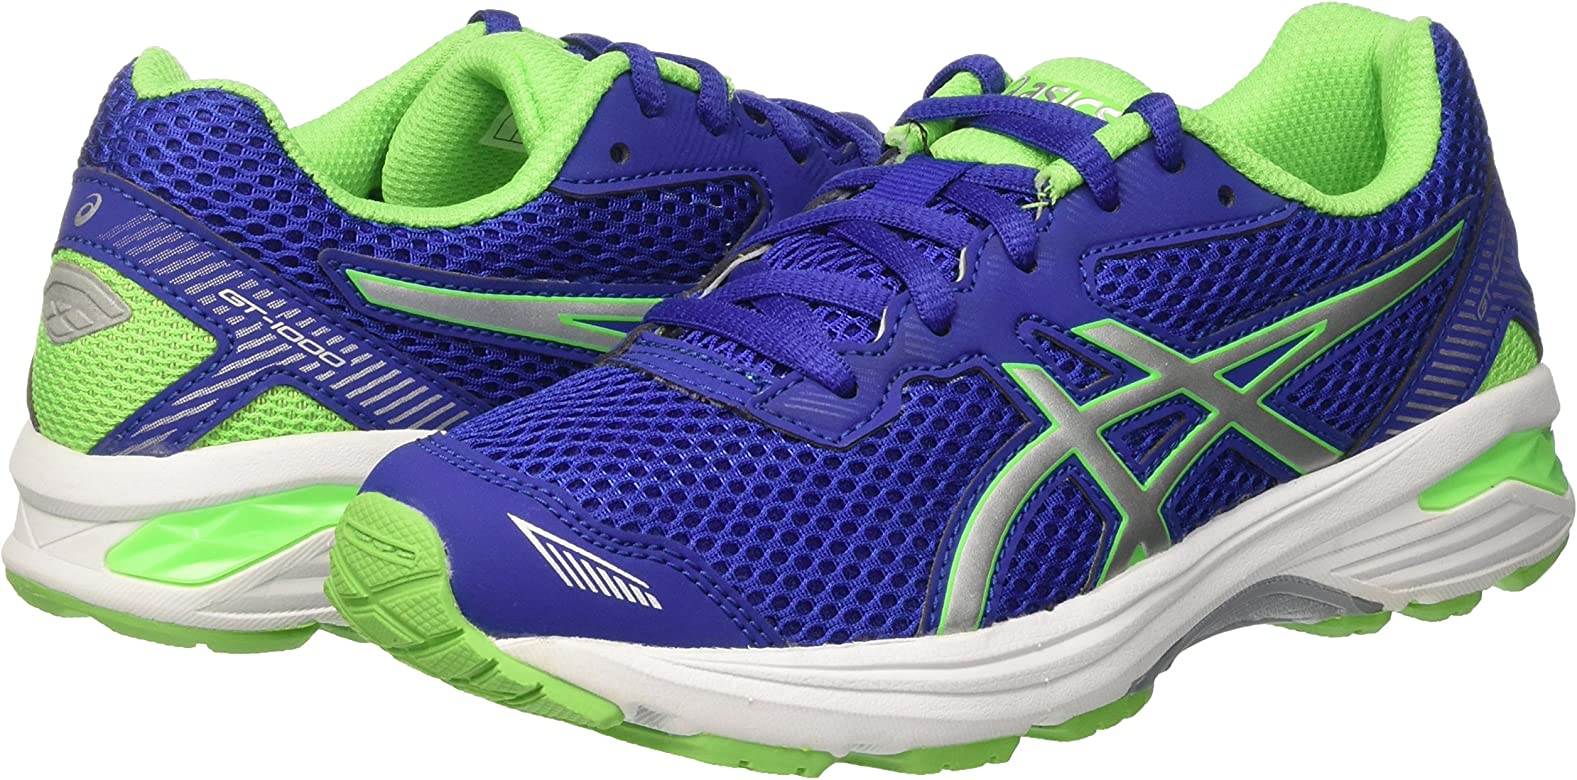 Asics Gt-1000 5 GS, Zapatillas de Gimnasia Unisex-niños, BLU Blue/White/Green Gecko, 34 1/2 EU: MainApps: Amazon.es: Zapatos y complementos